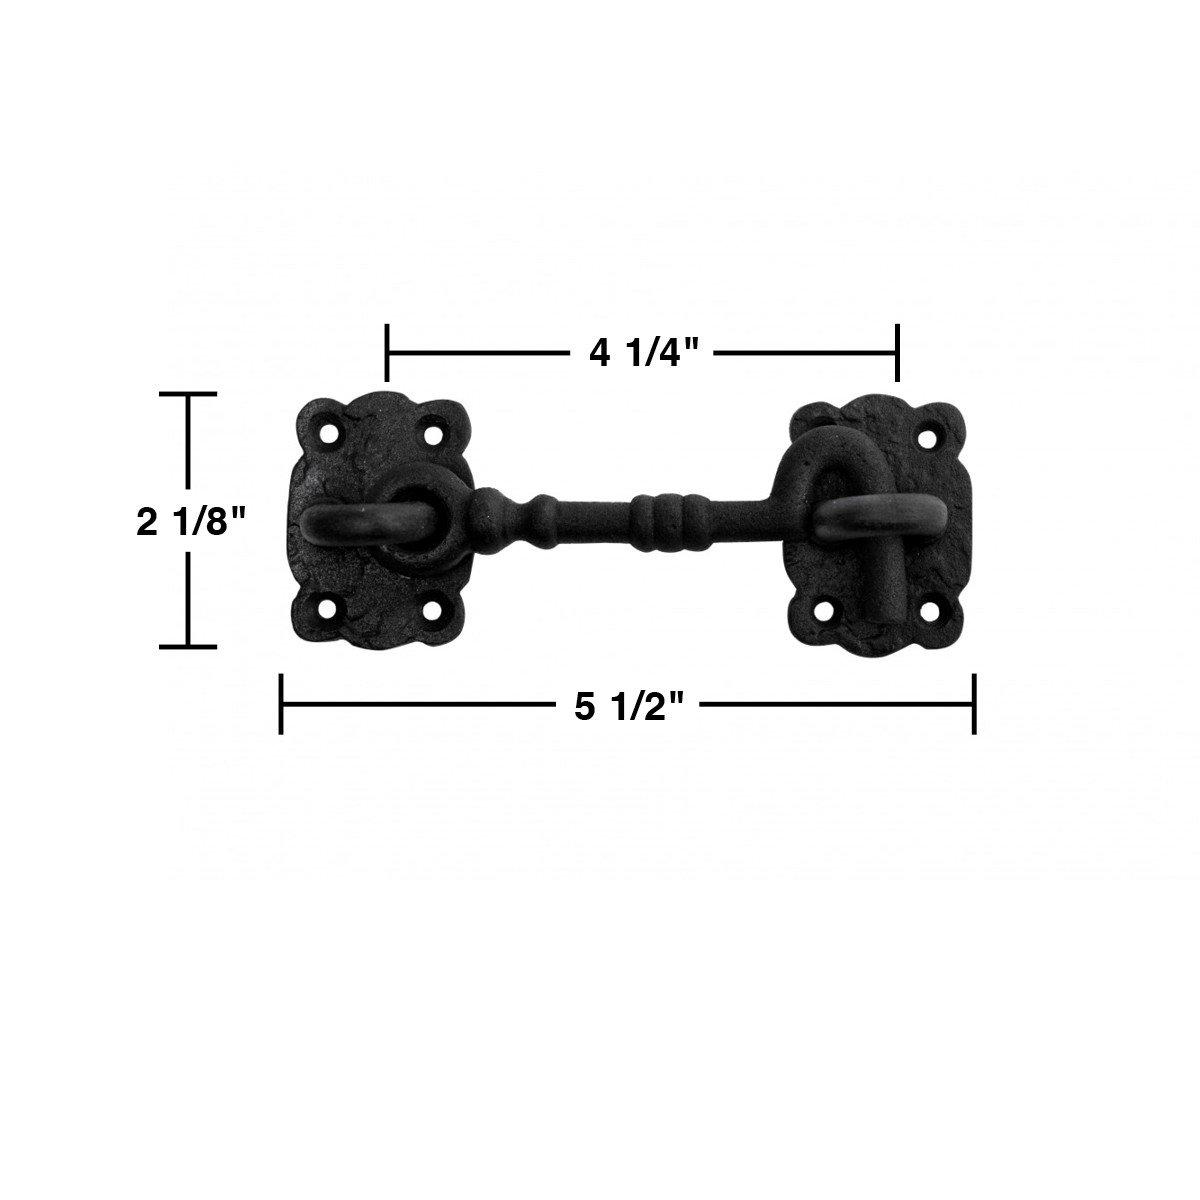 3 Iron Cabin Hooks Eye Shed Door Latch Black Fancy 5 1/2'' | Renovator's Supply by Renovator's Supply (Image #3)